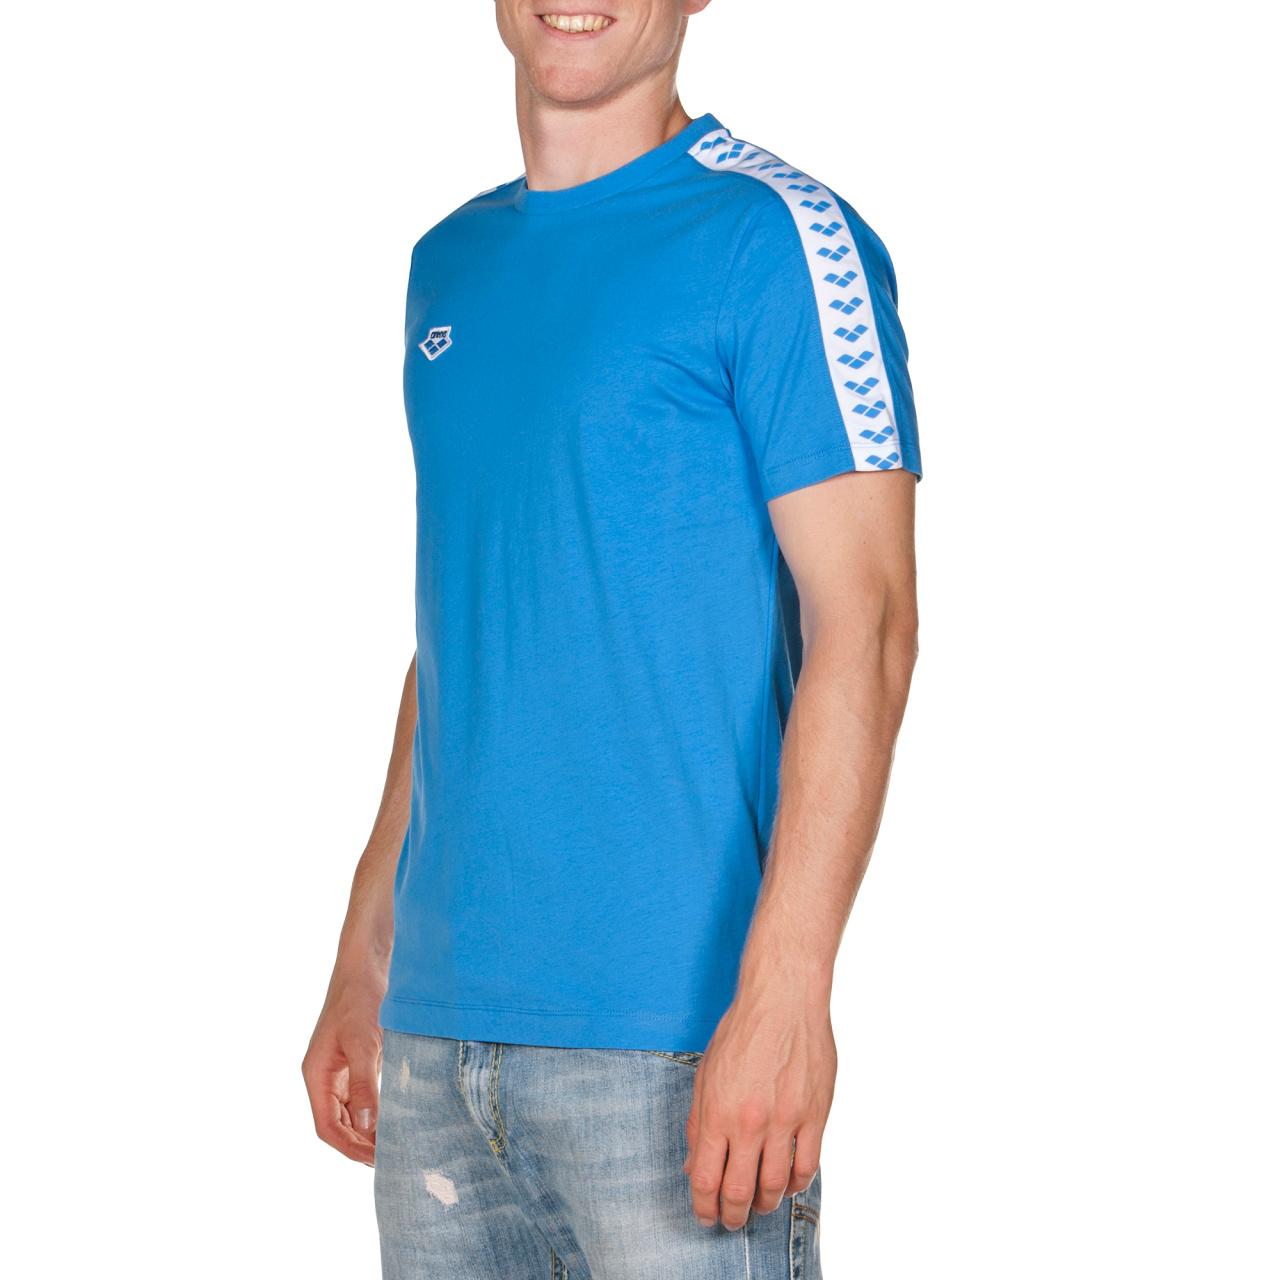 Camiseta Icons arena para Hombre Relax Team_6773